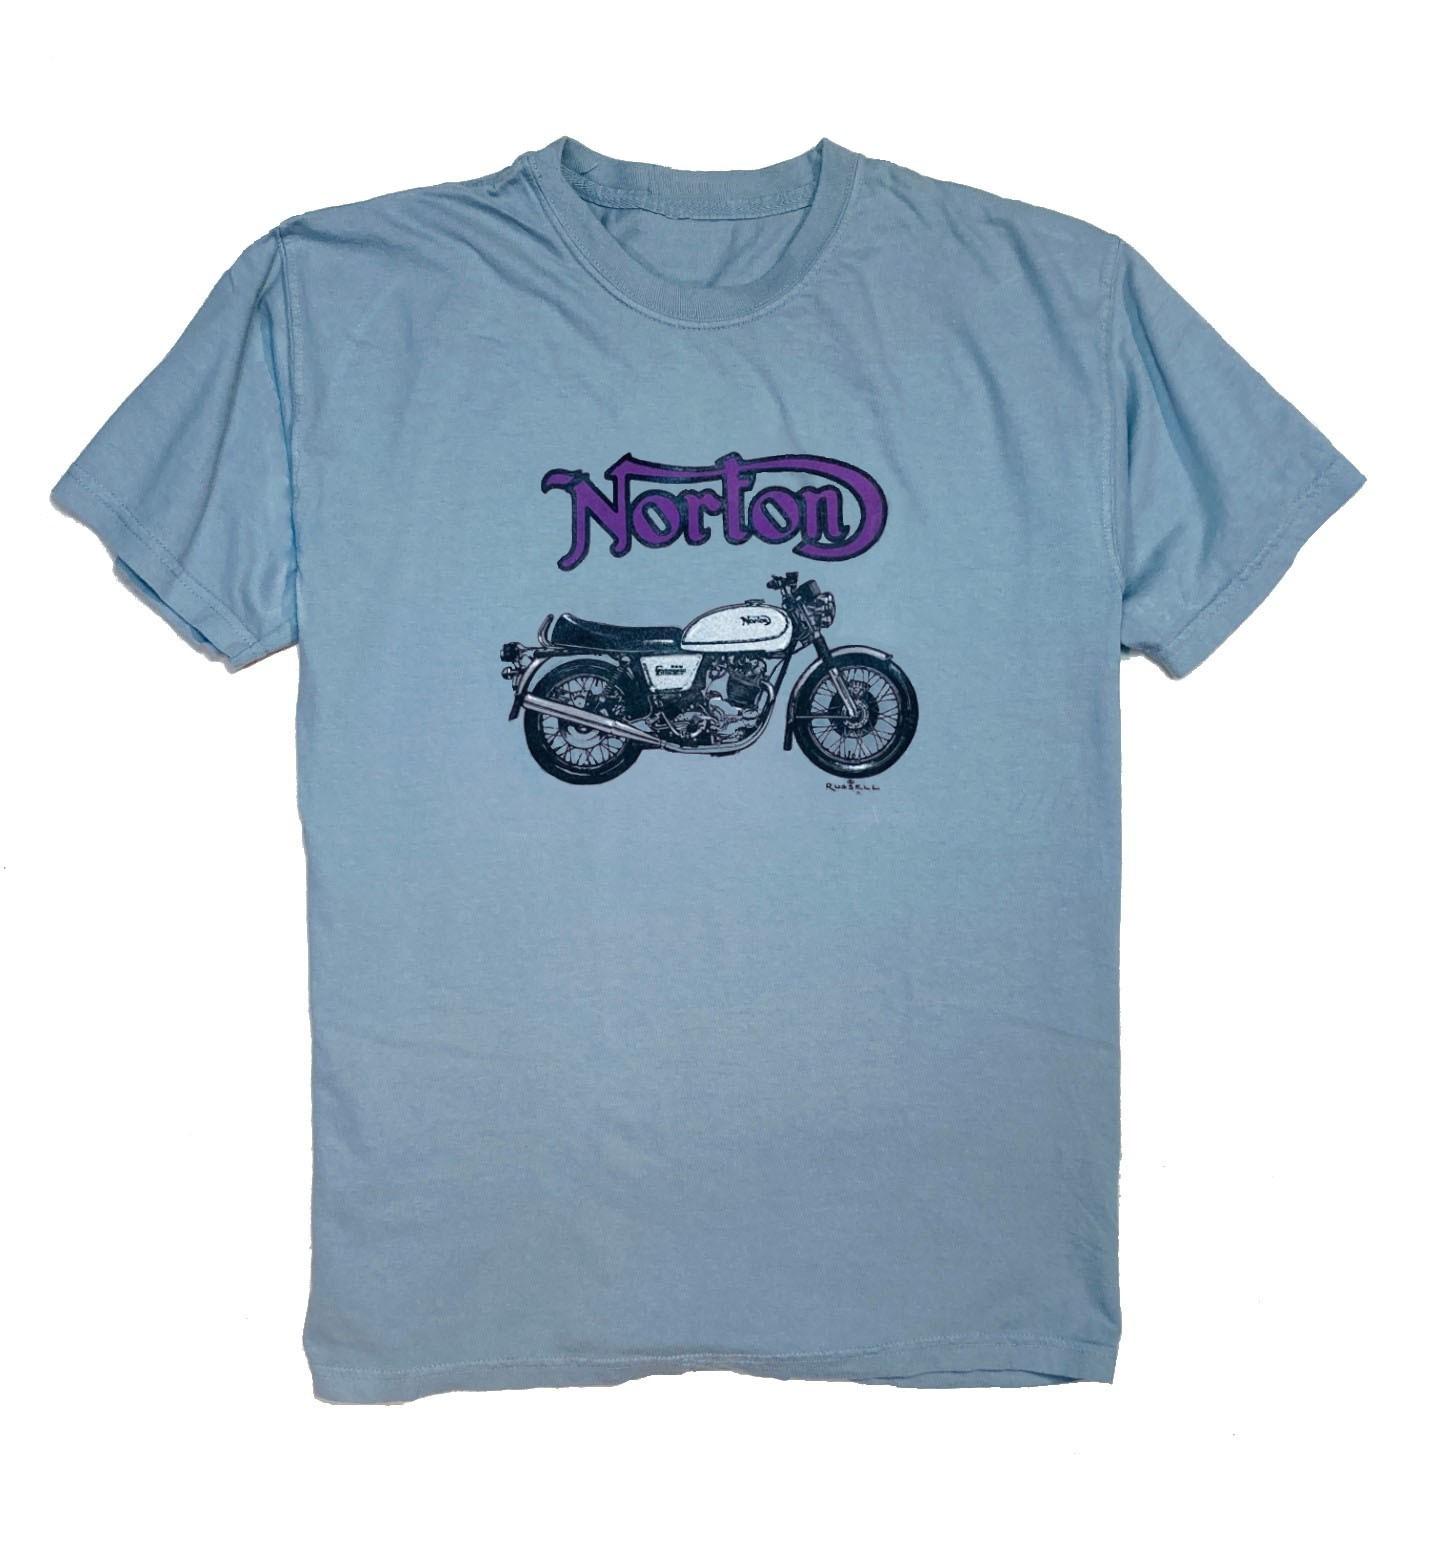 Vintage Norton t-shirt